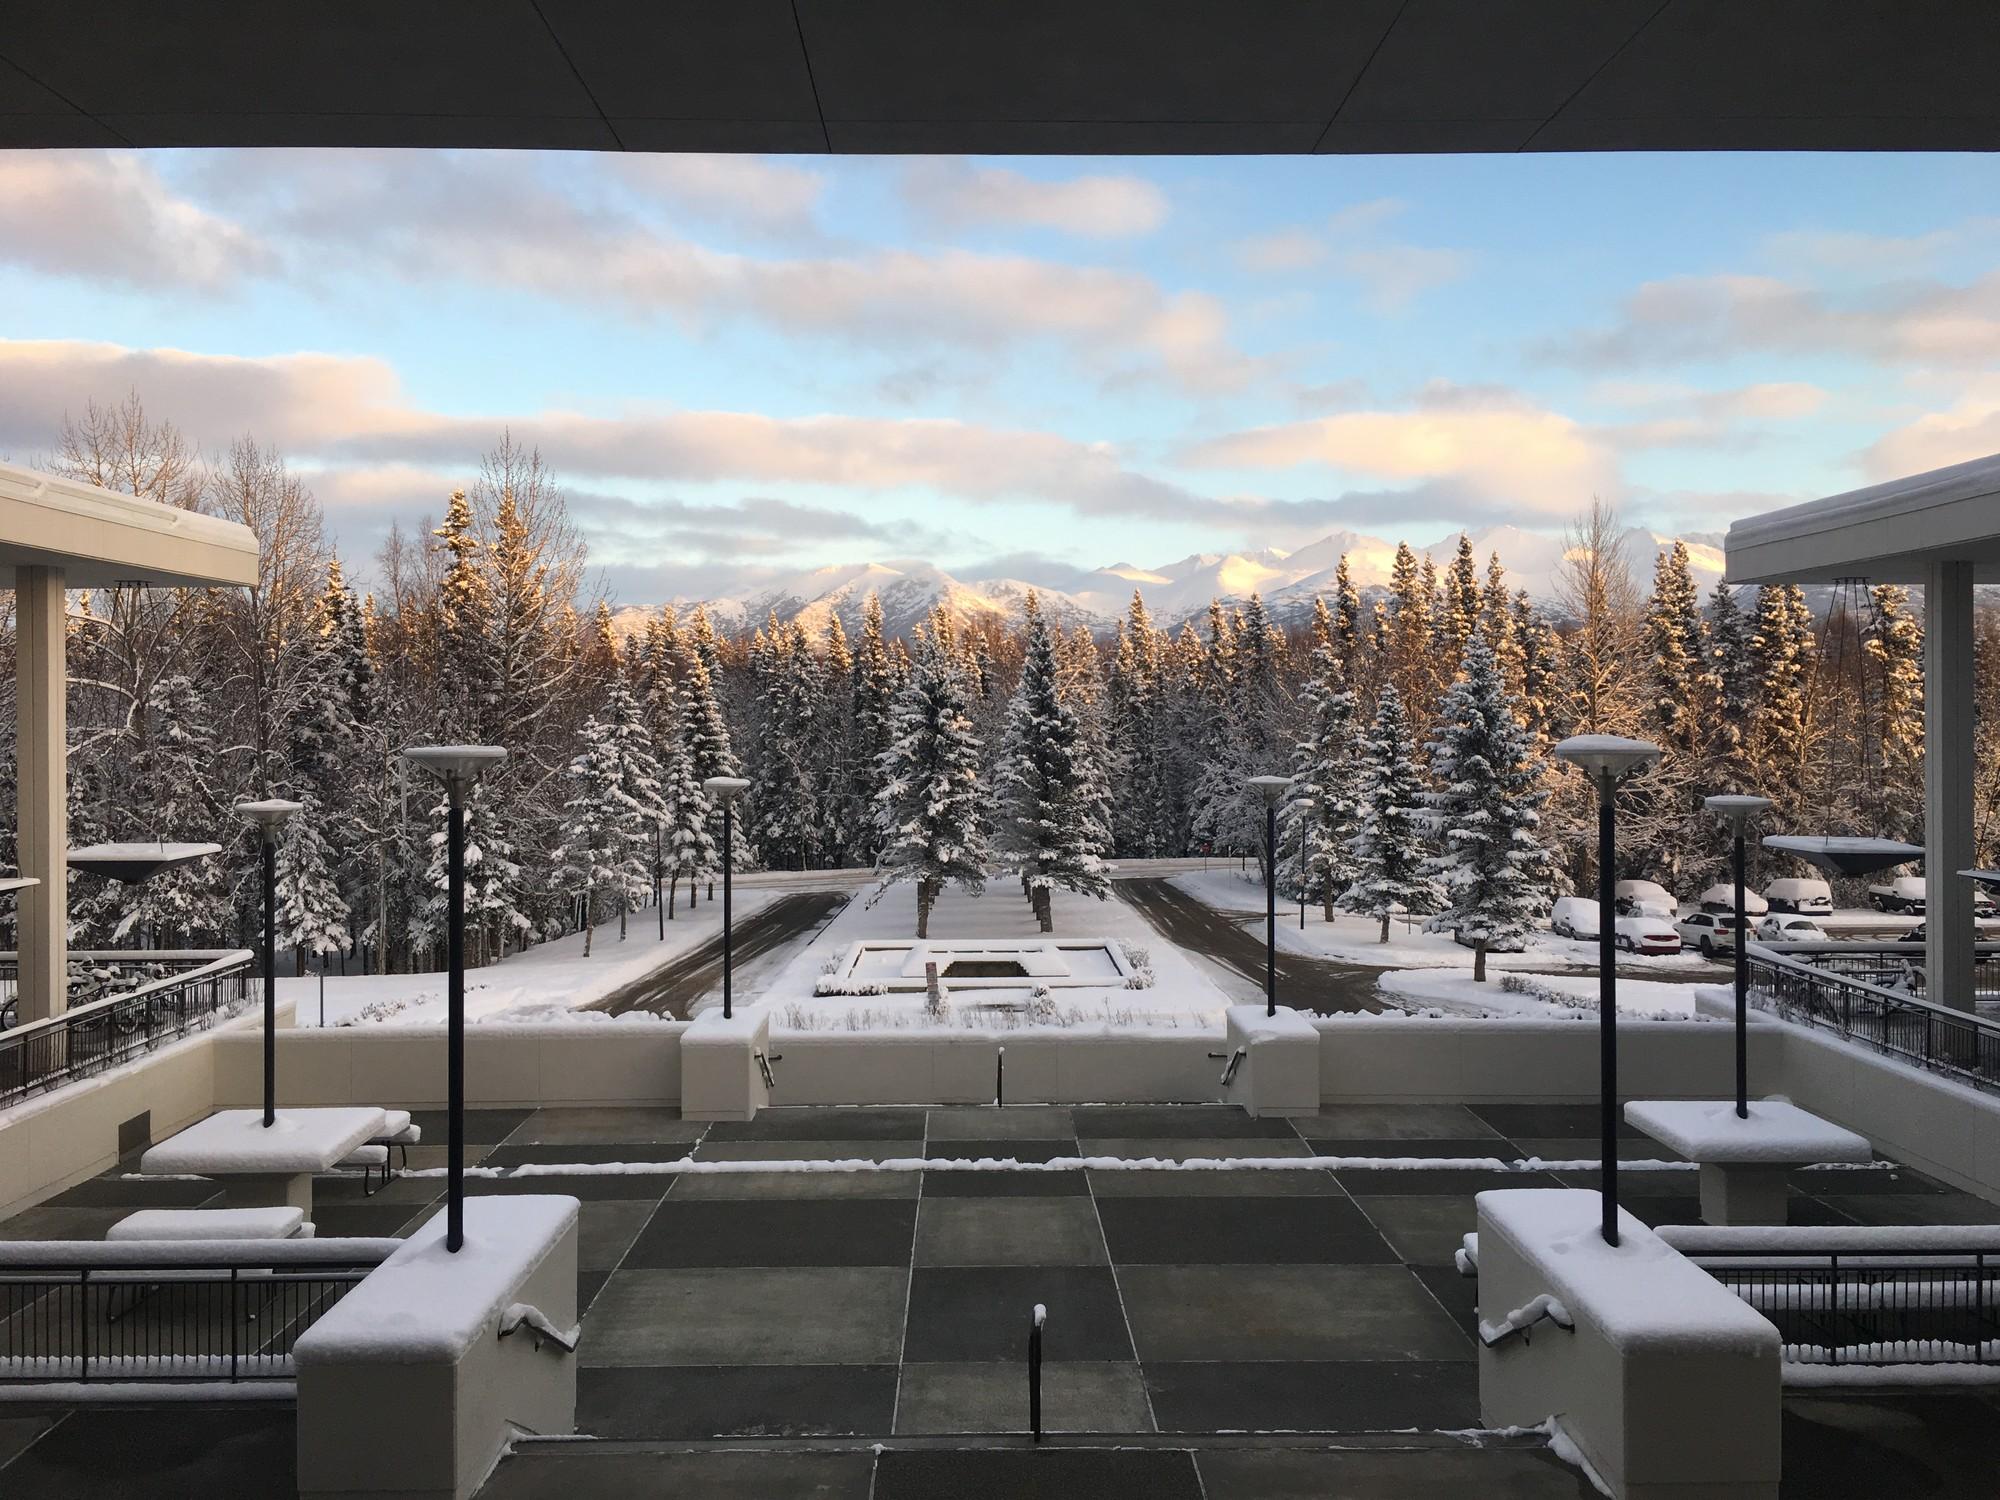 PC: Alaska Pacific Chess